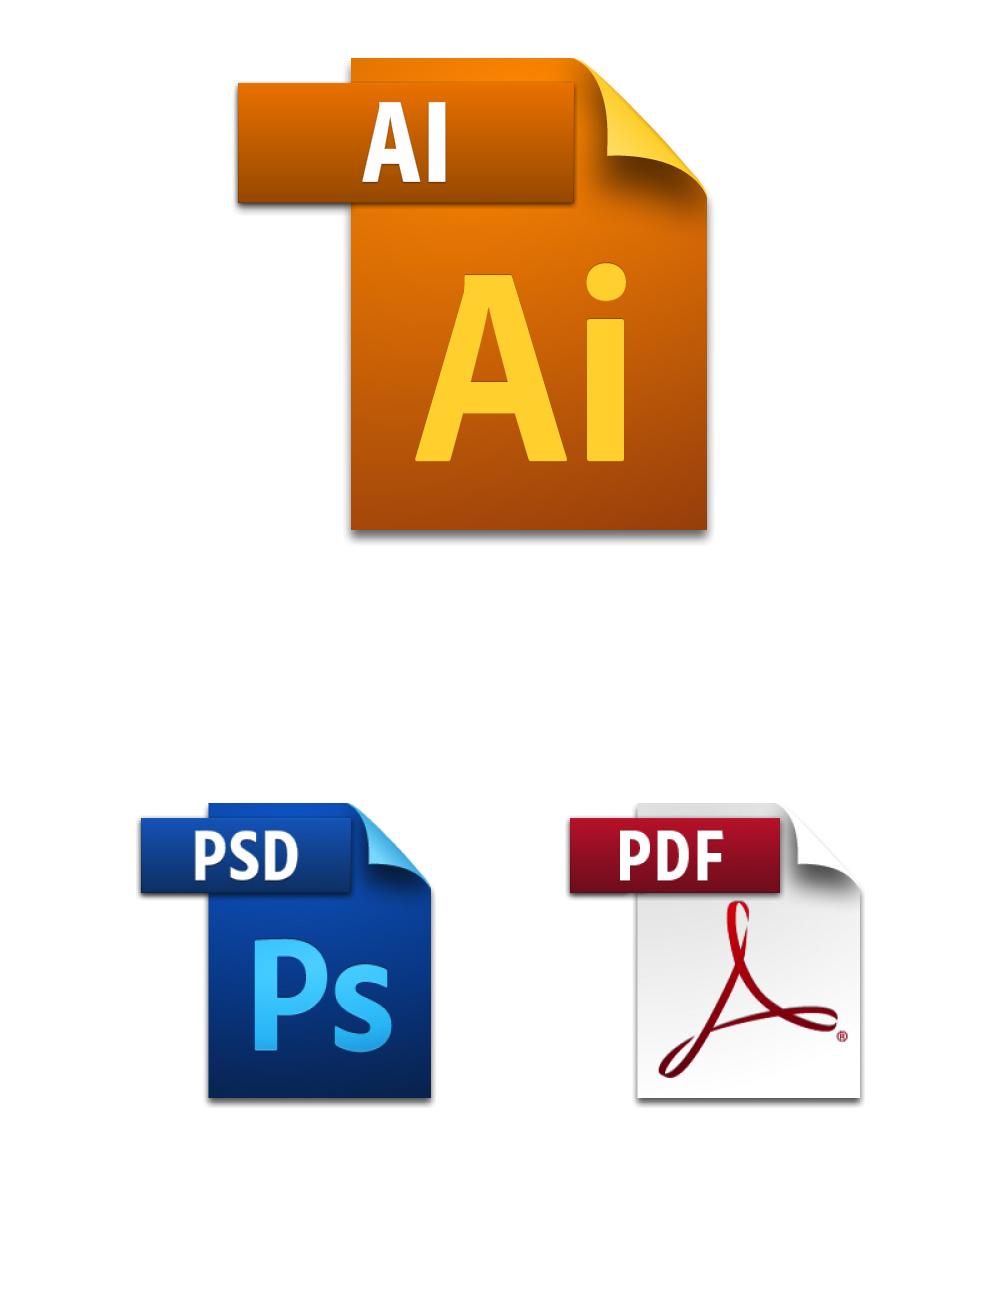 Adobe_Illustrator_.AI_File_Icon.jpg